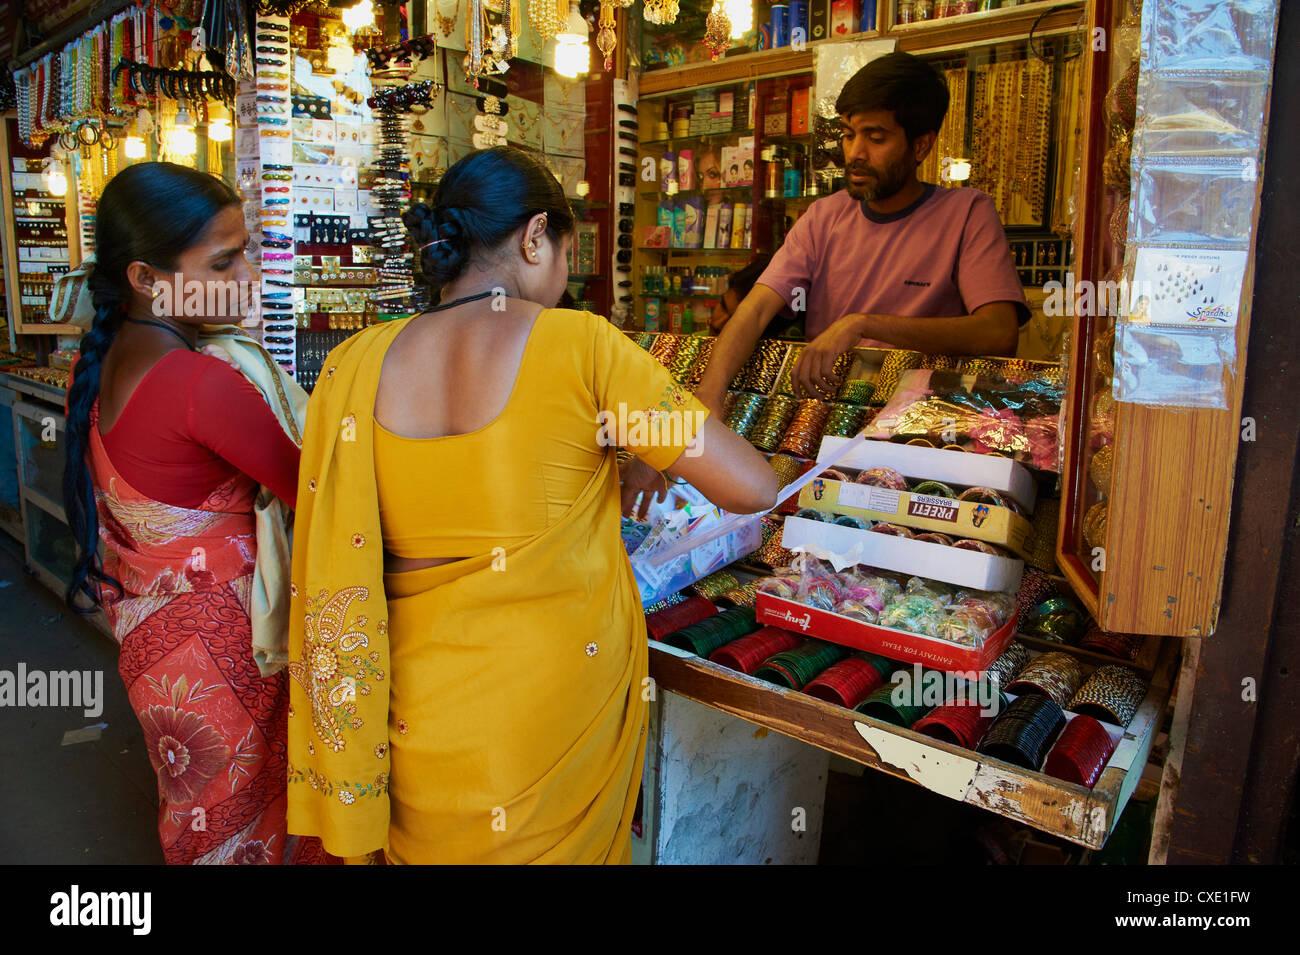 Bracelets and bangles for sale, Devaraja market, Mysore, Karnataka, India, Asia - Stock Image